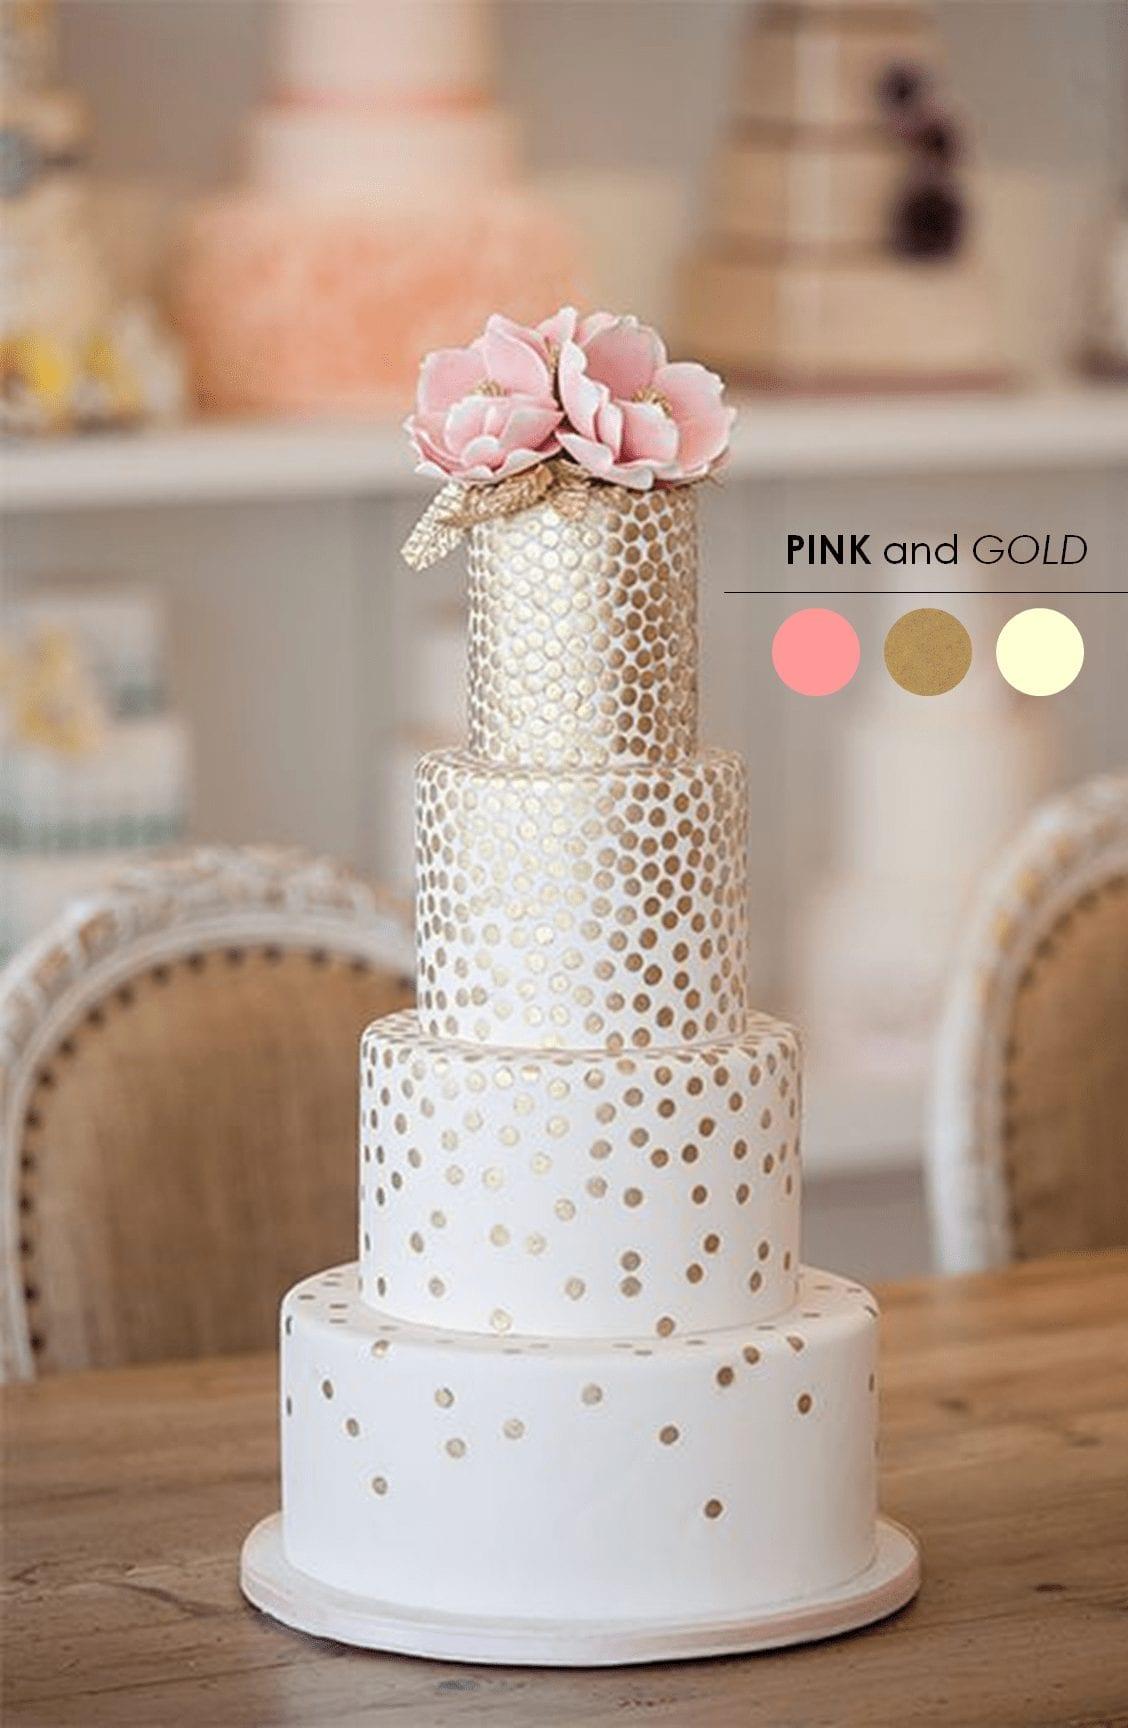 Choosing your wedding colors - palette ideas